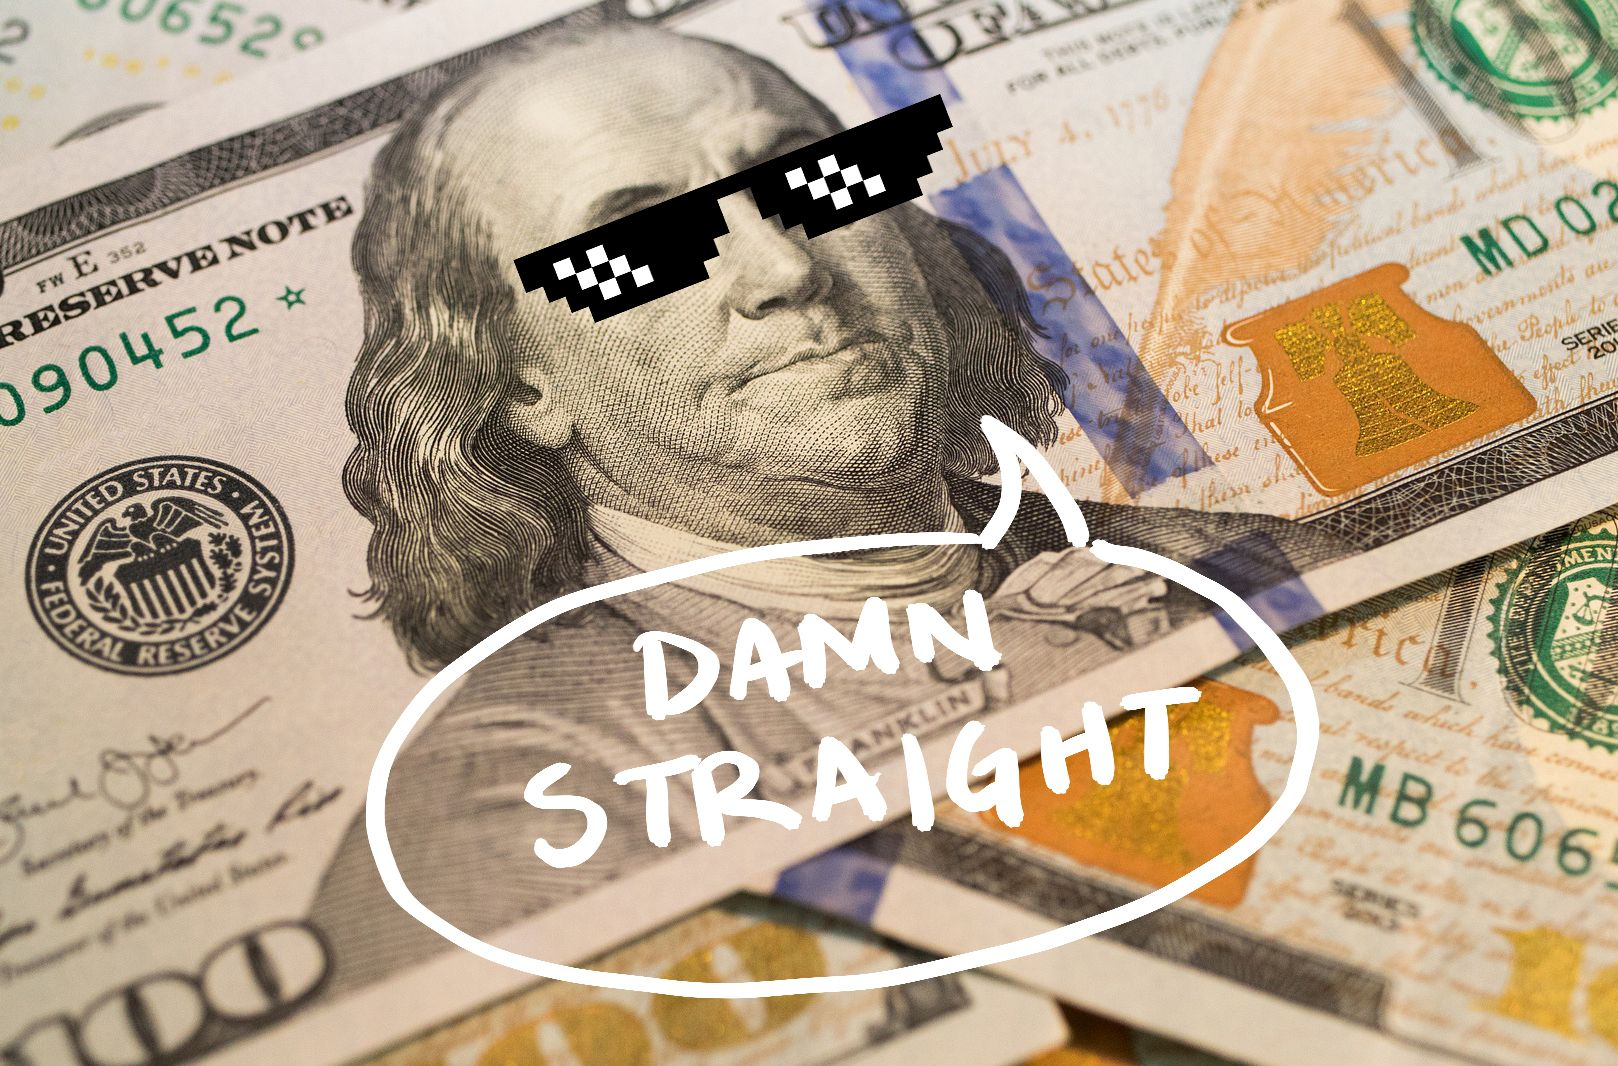 Benjamin Franklin wearing sunglasses